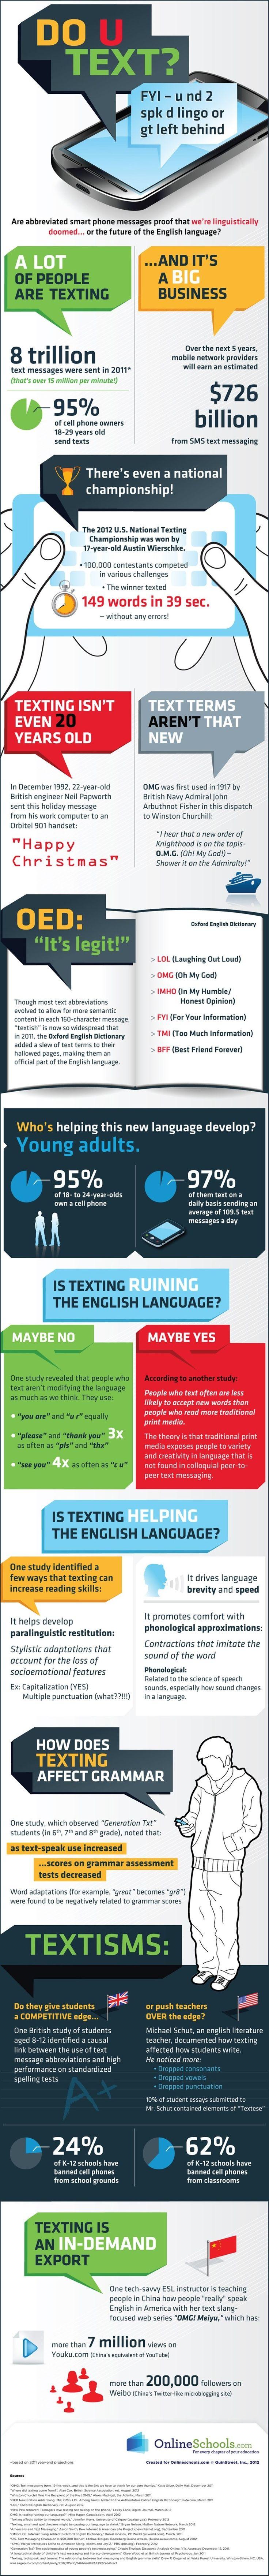 texting ruining the english language